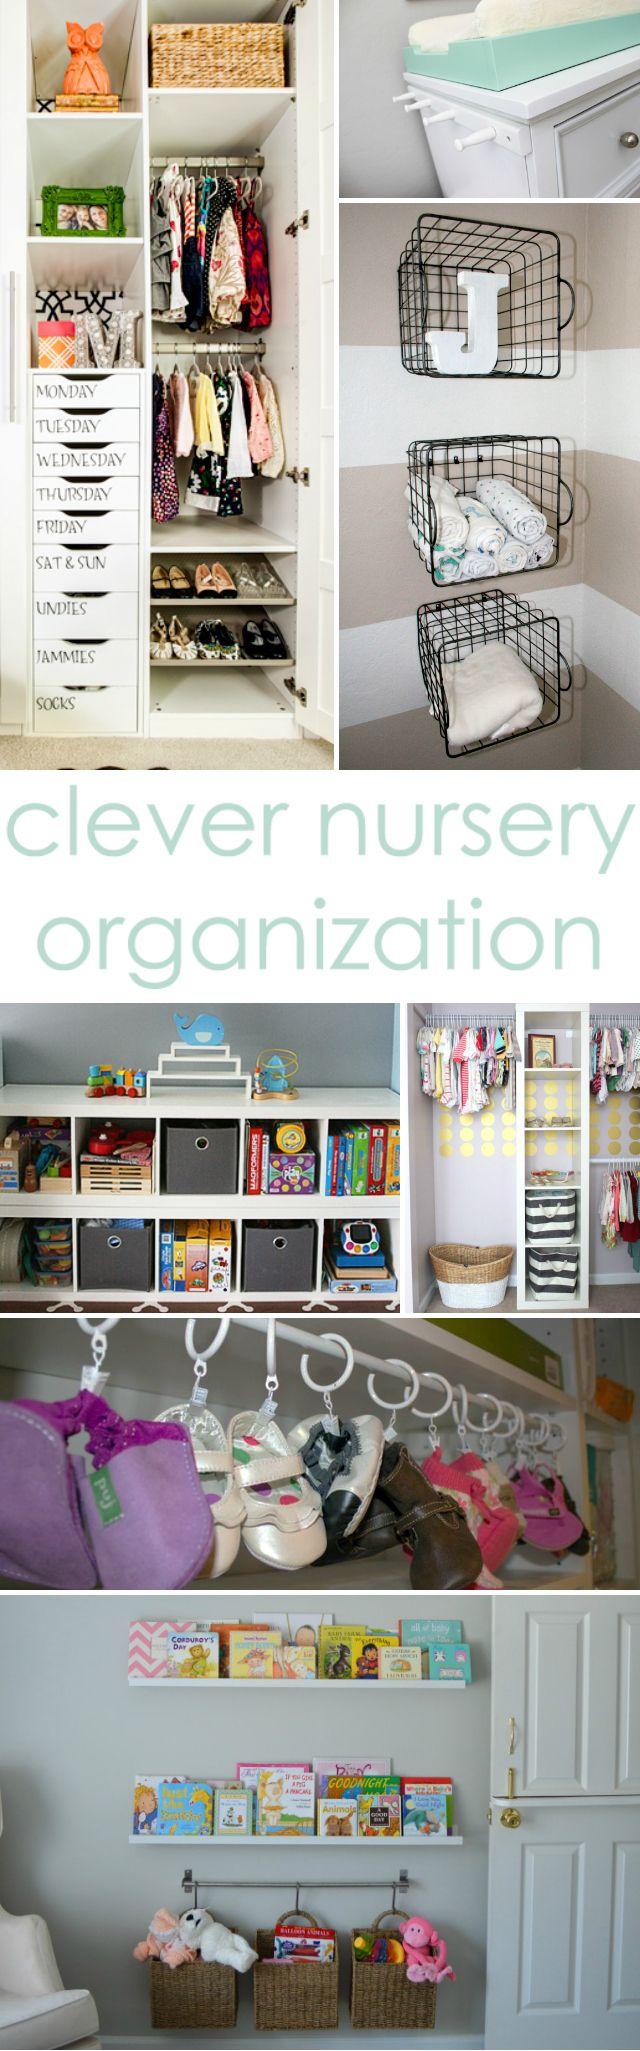 Nursery organization on pinterest changing tables for Baby organizer ideas